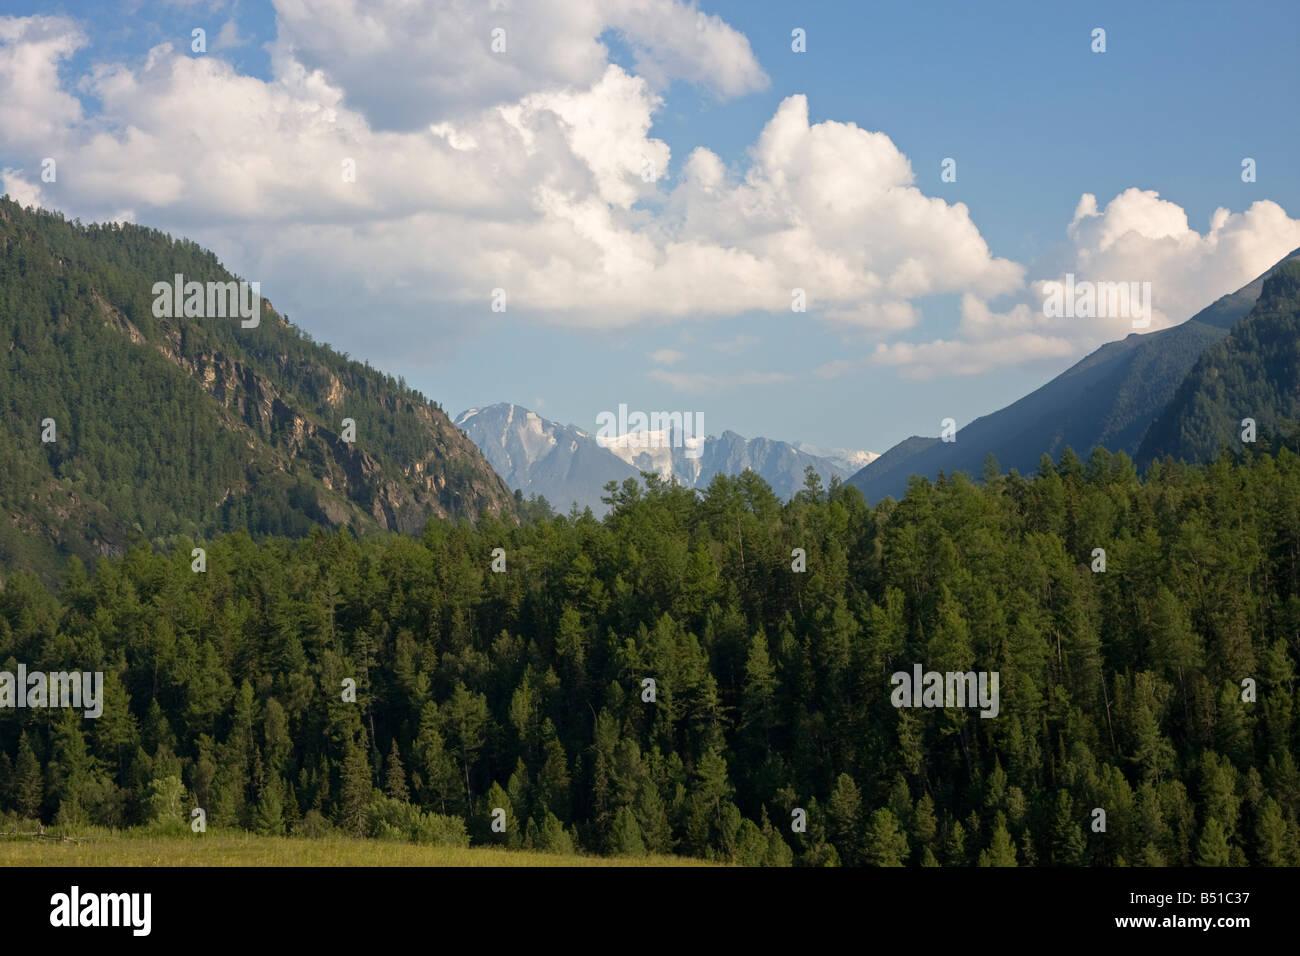 Valley of Kucherla river, Altai mountains, Siberia, Russia - Stock Image